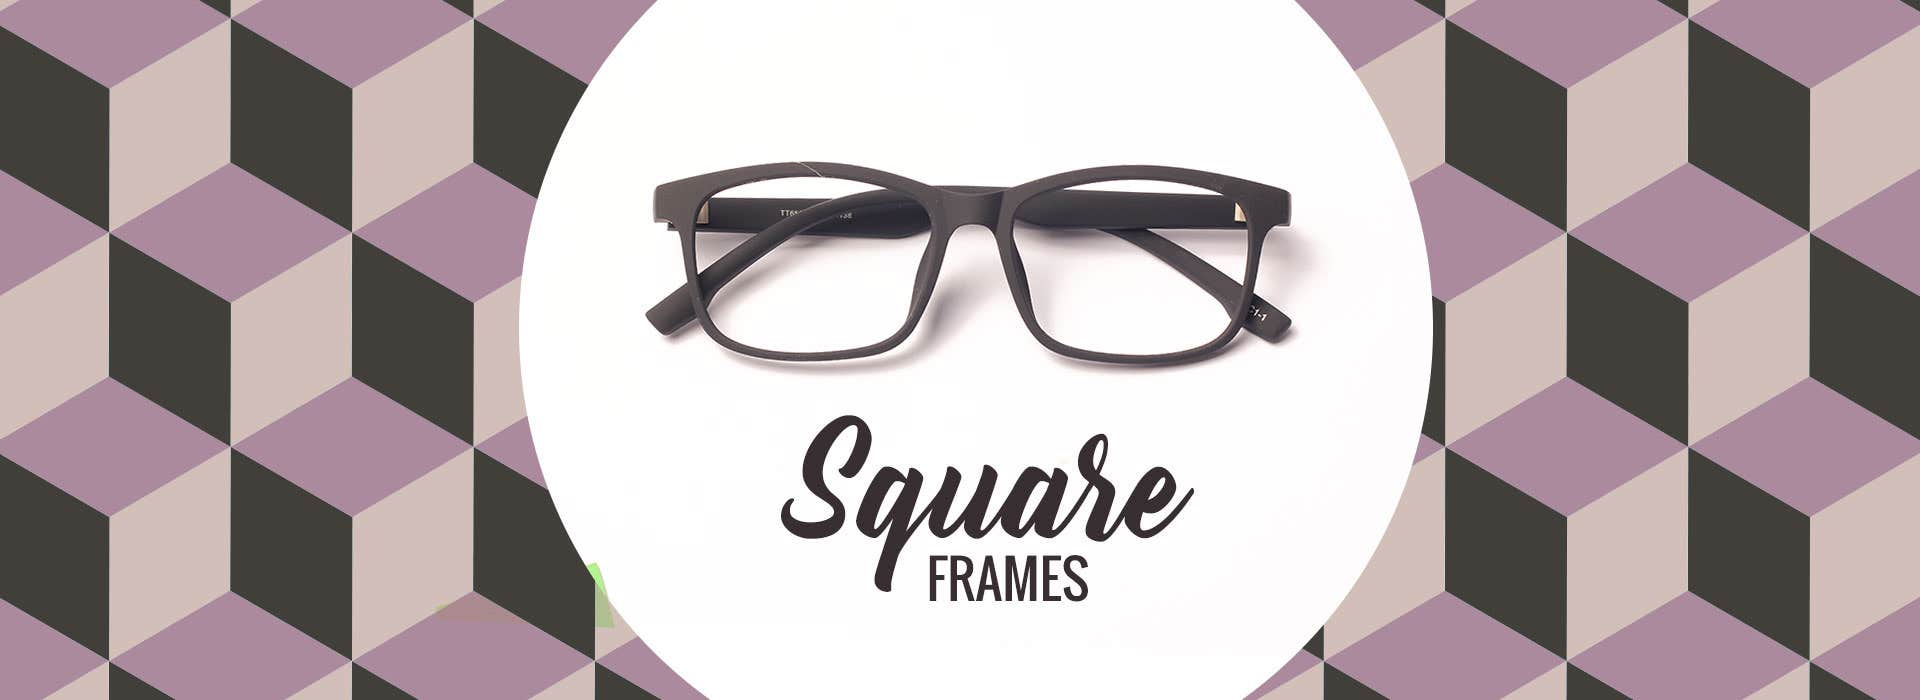 Buy Square Eyeglasses at Goggles4U